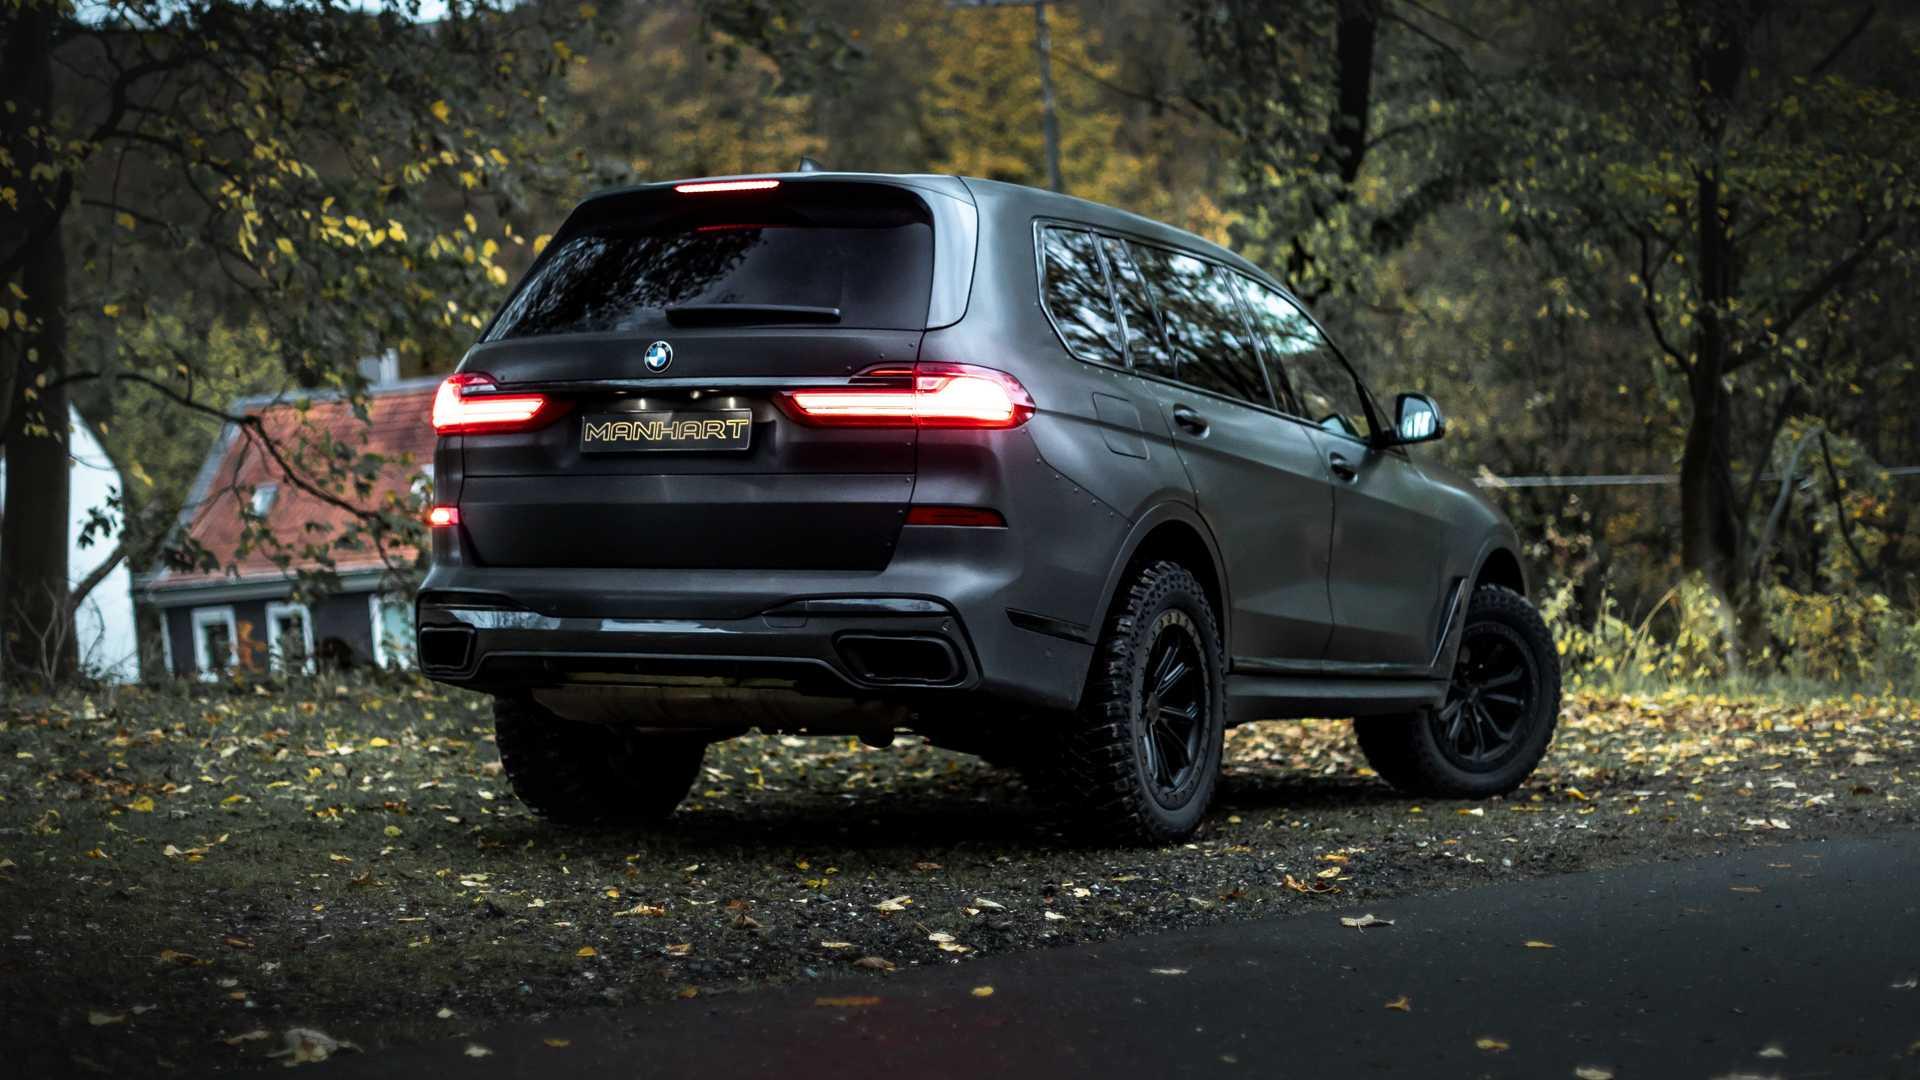 BMW-X7-Dirt-Edition-By-Manhart-7